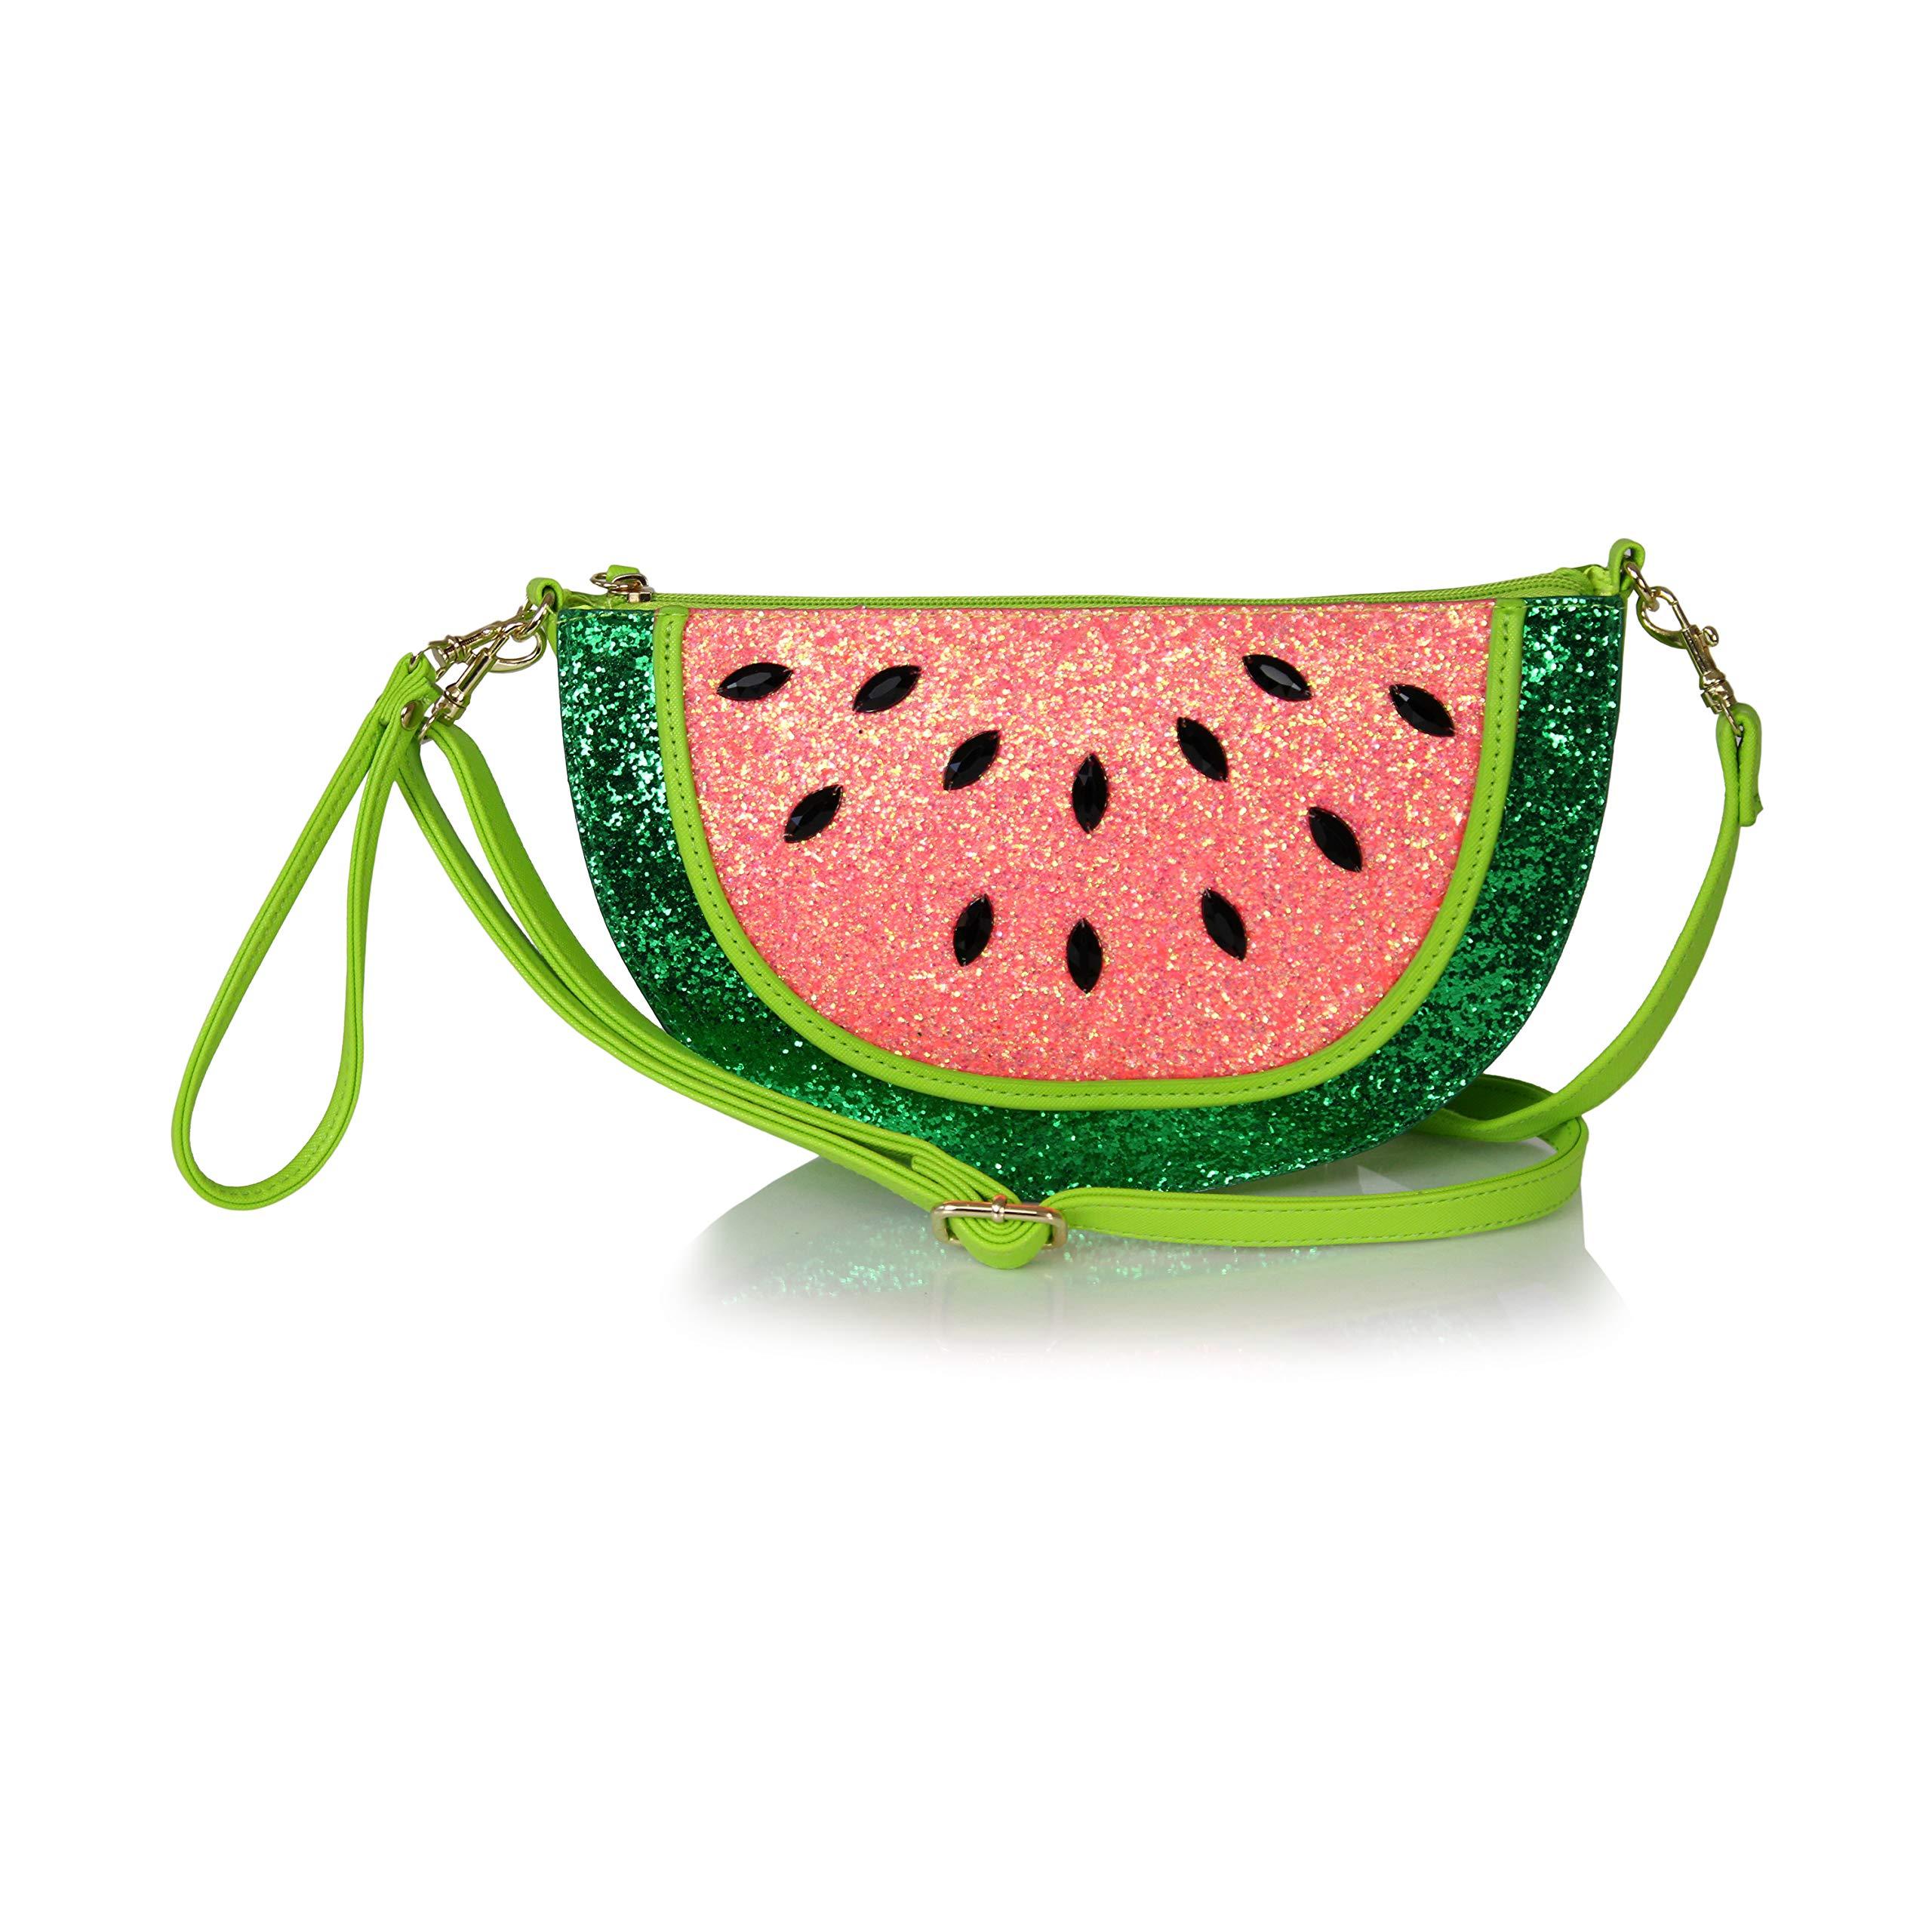 Cute Fruit Summer Shoulder Bag- Watermelon Messenger Sling Crossbody Purse or Clutch (Watermelon)